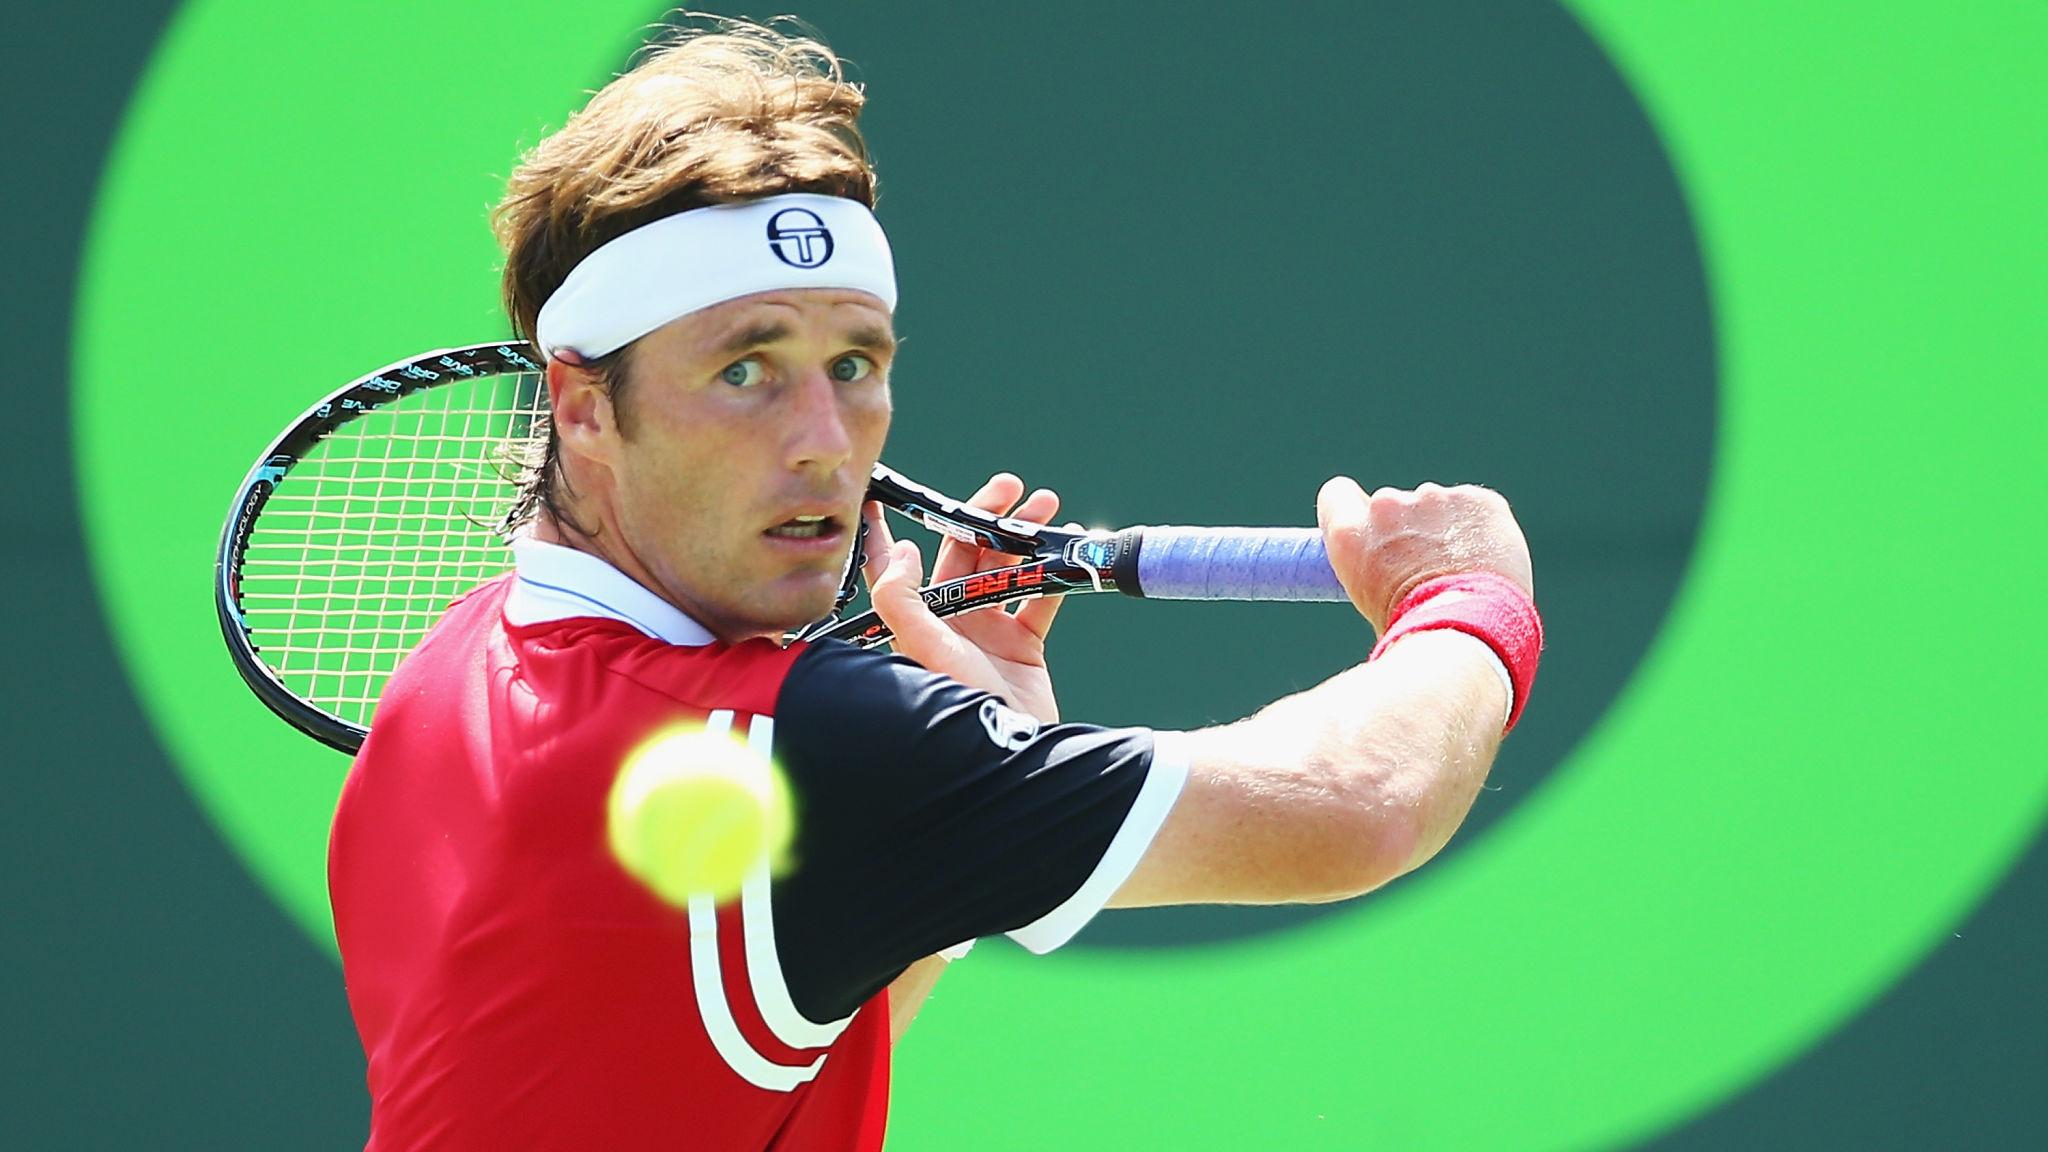 Hottest Tennis Players - US Open Men's Singles